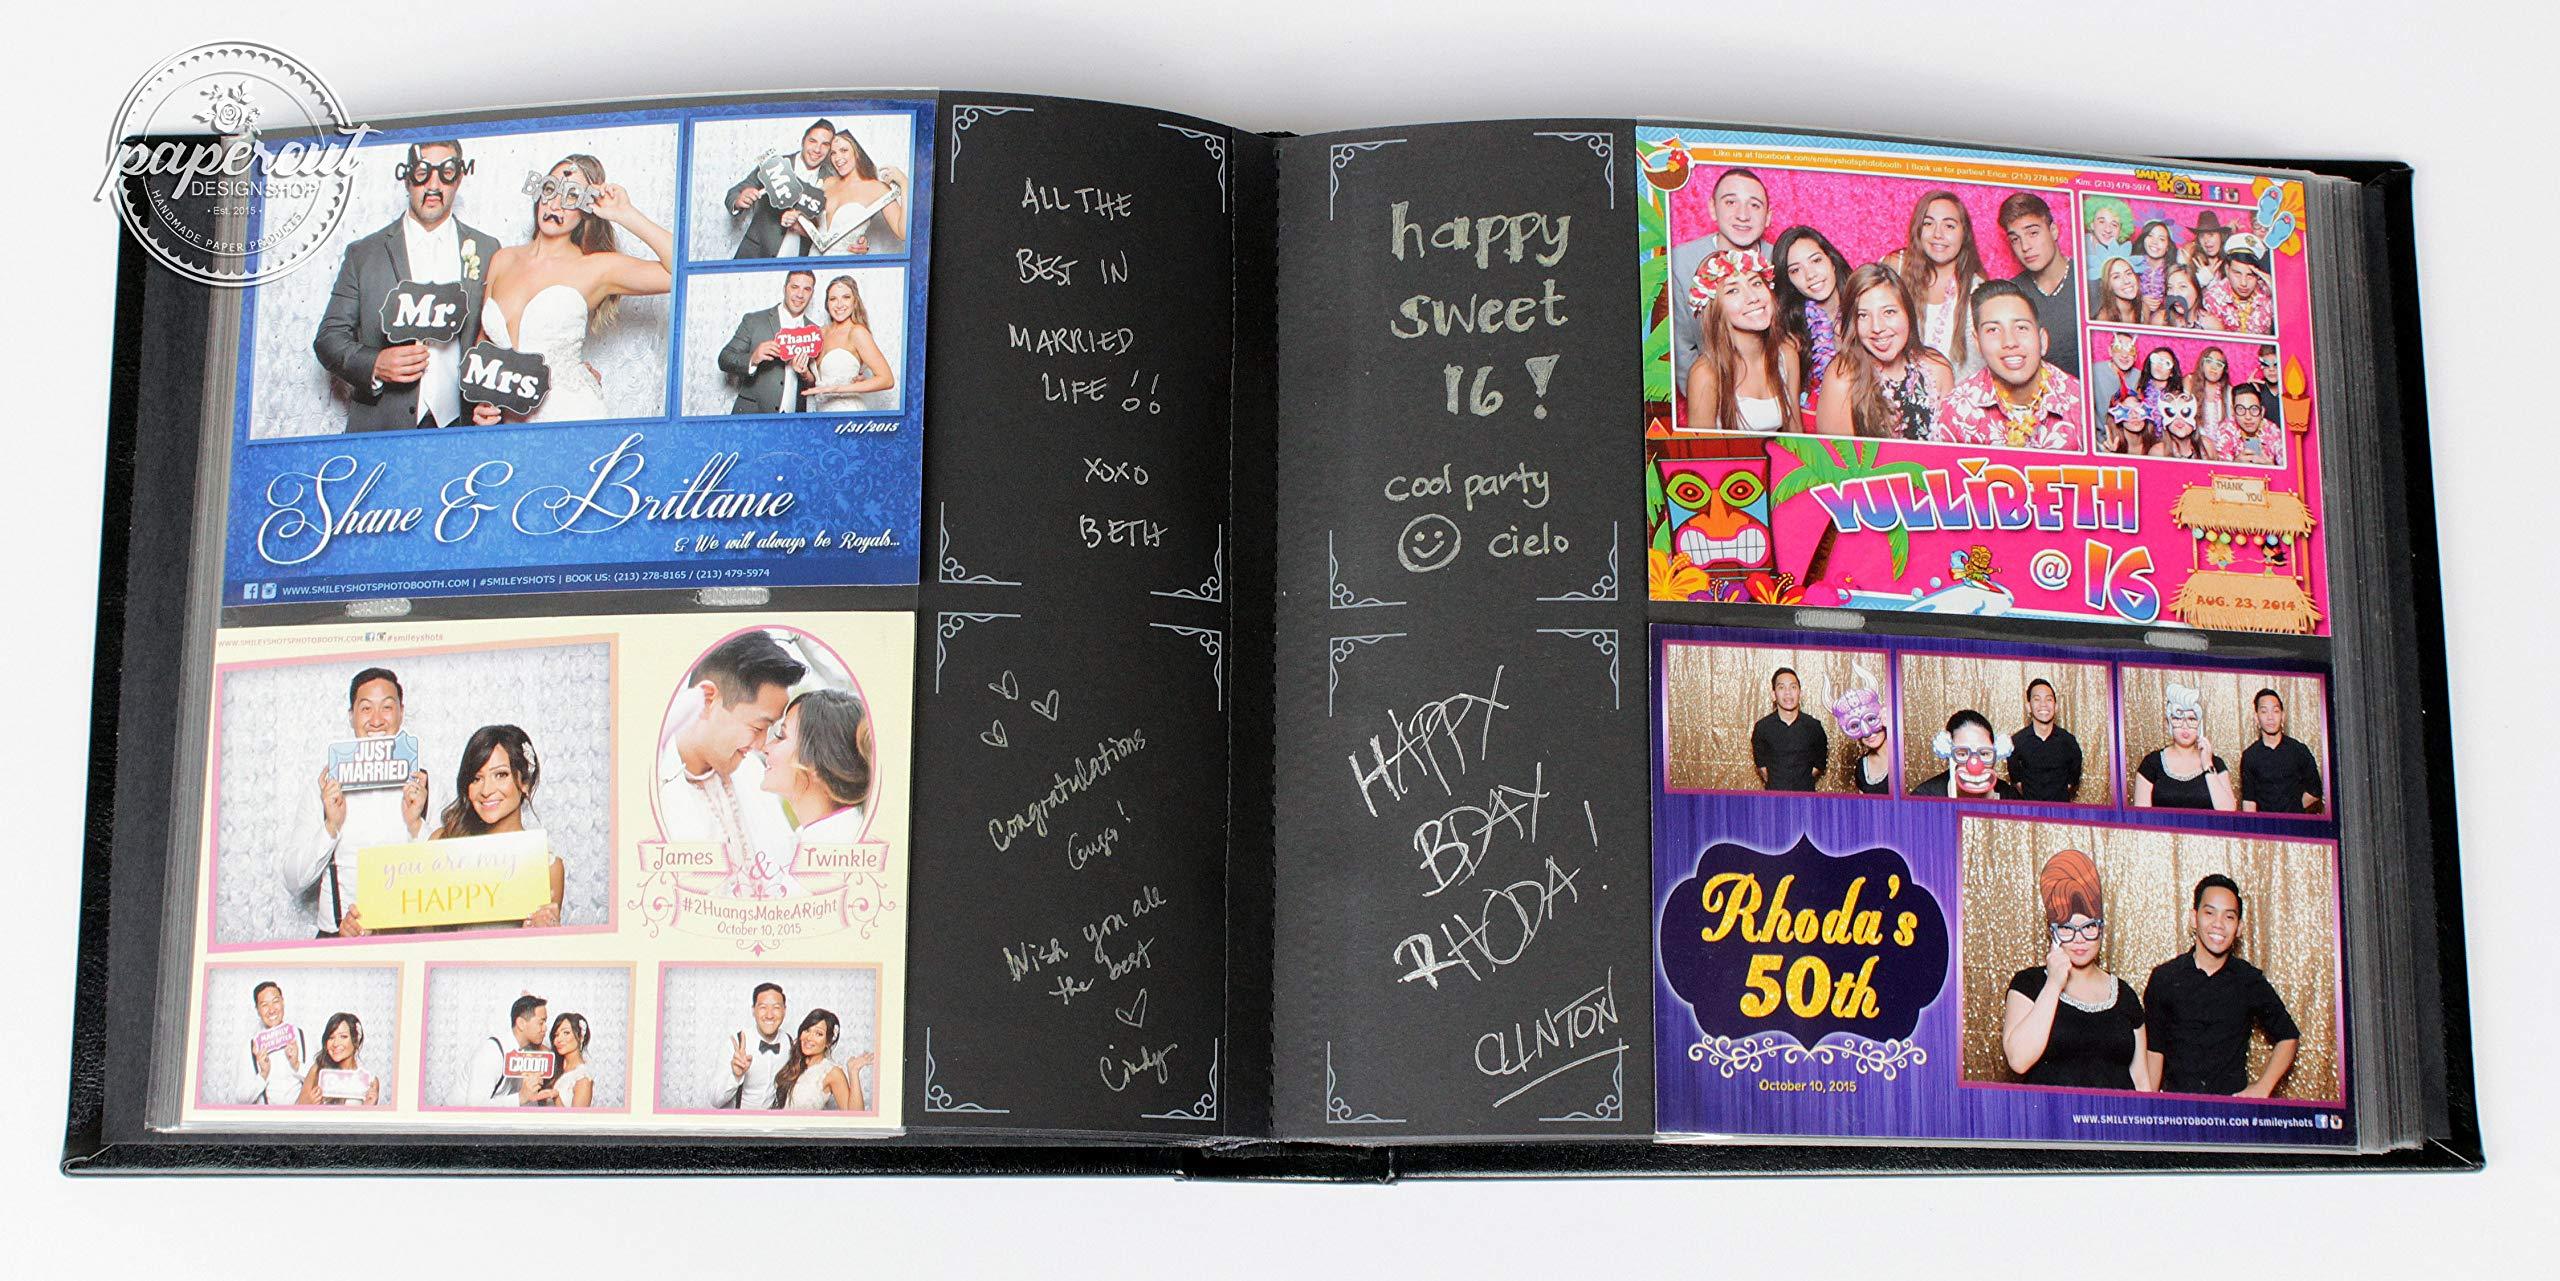 Paper Cut Design Shop Photo Booth Album Slip-in Plastic Slots with Box, Elegant Black Leatherette Album 4x6 Photos